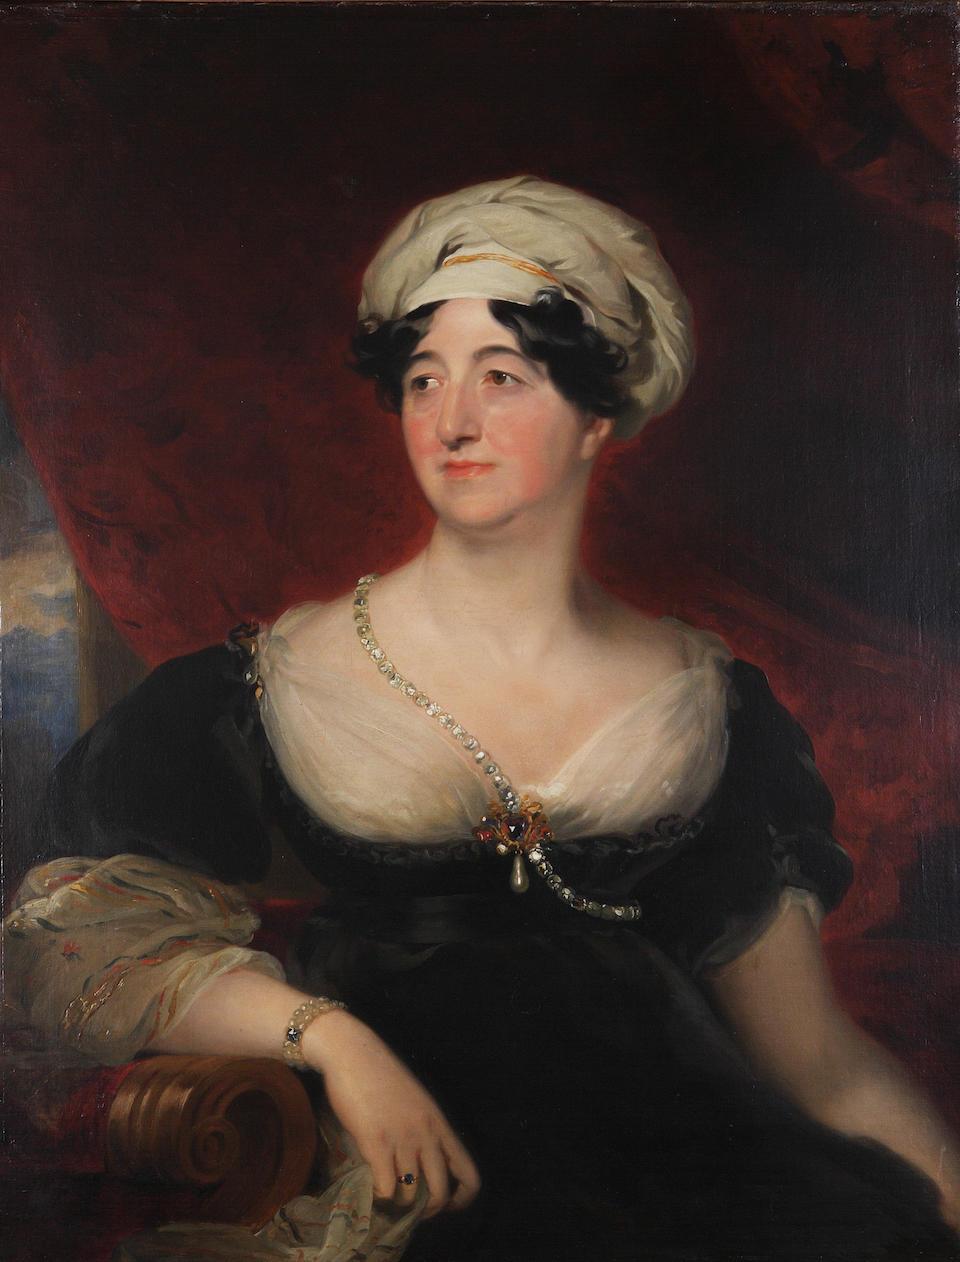 Attributed to Thomas Phillips (British, 1770-1845) Half length portrait of John, 4th Duke of Athole